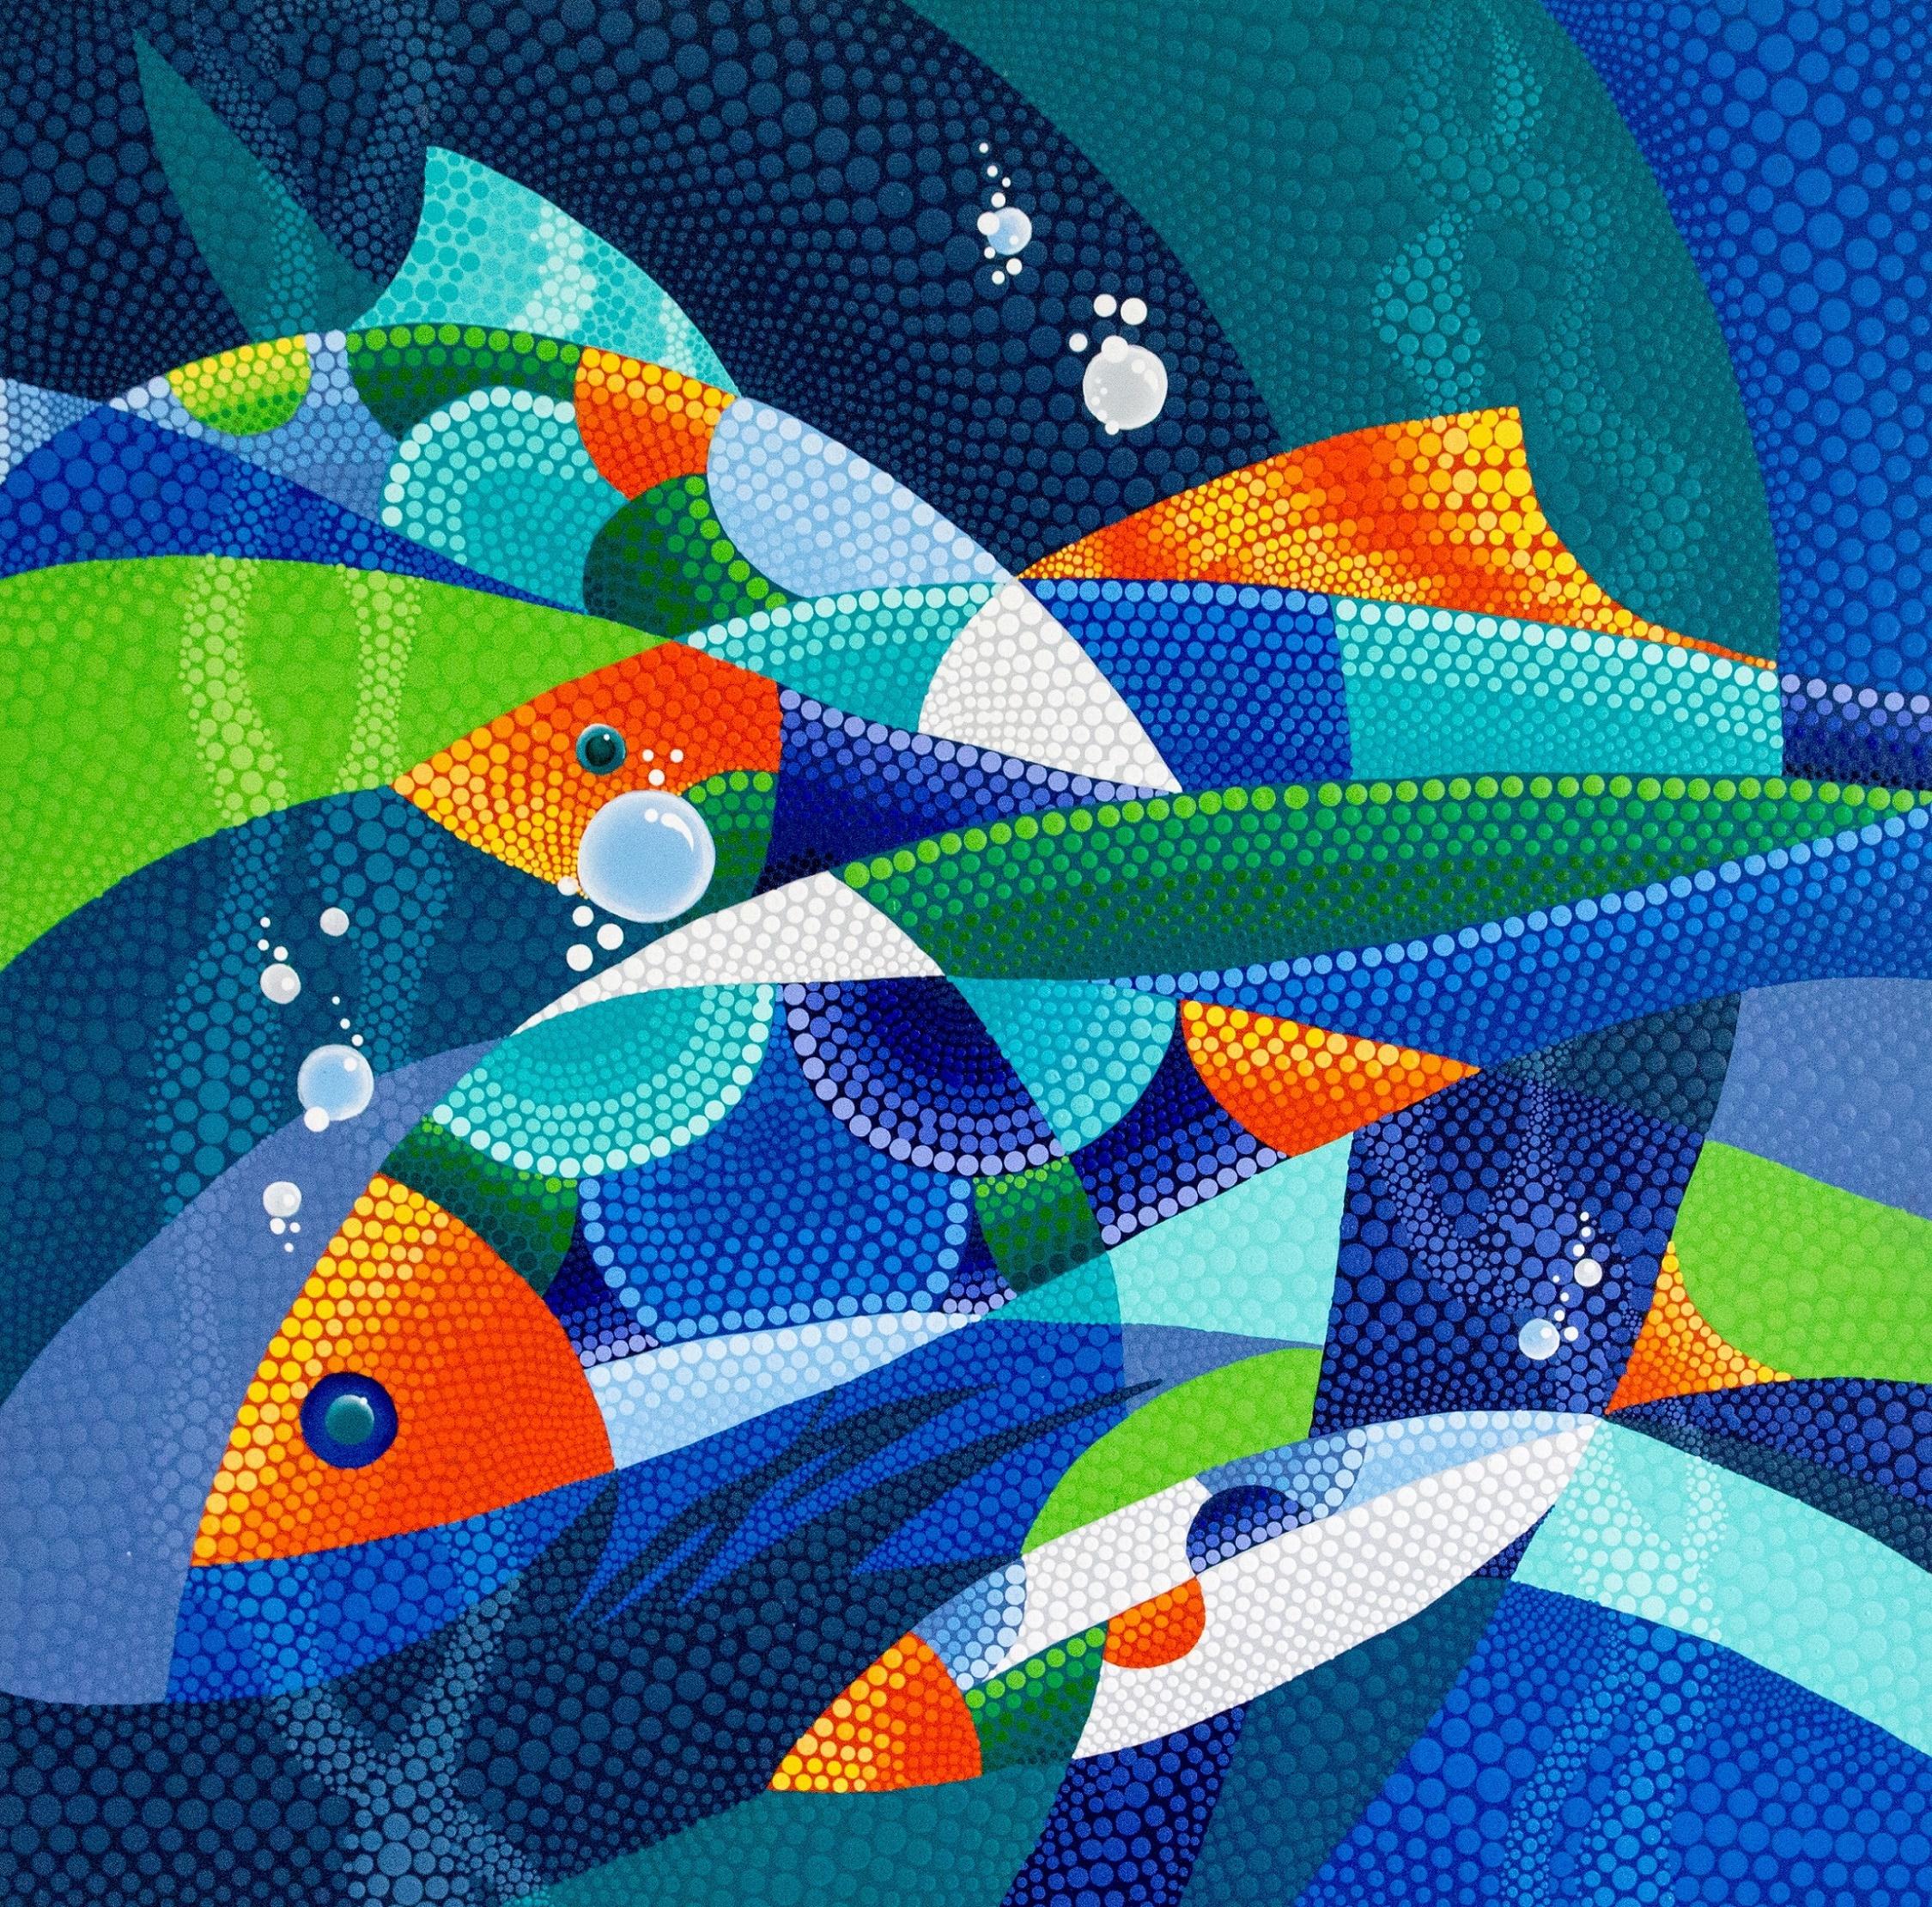 Angee Ferrin   Marine World  Acrylic on Canvas 28 x 28